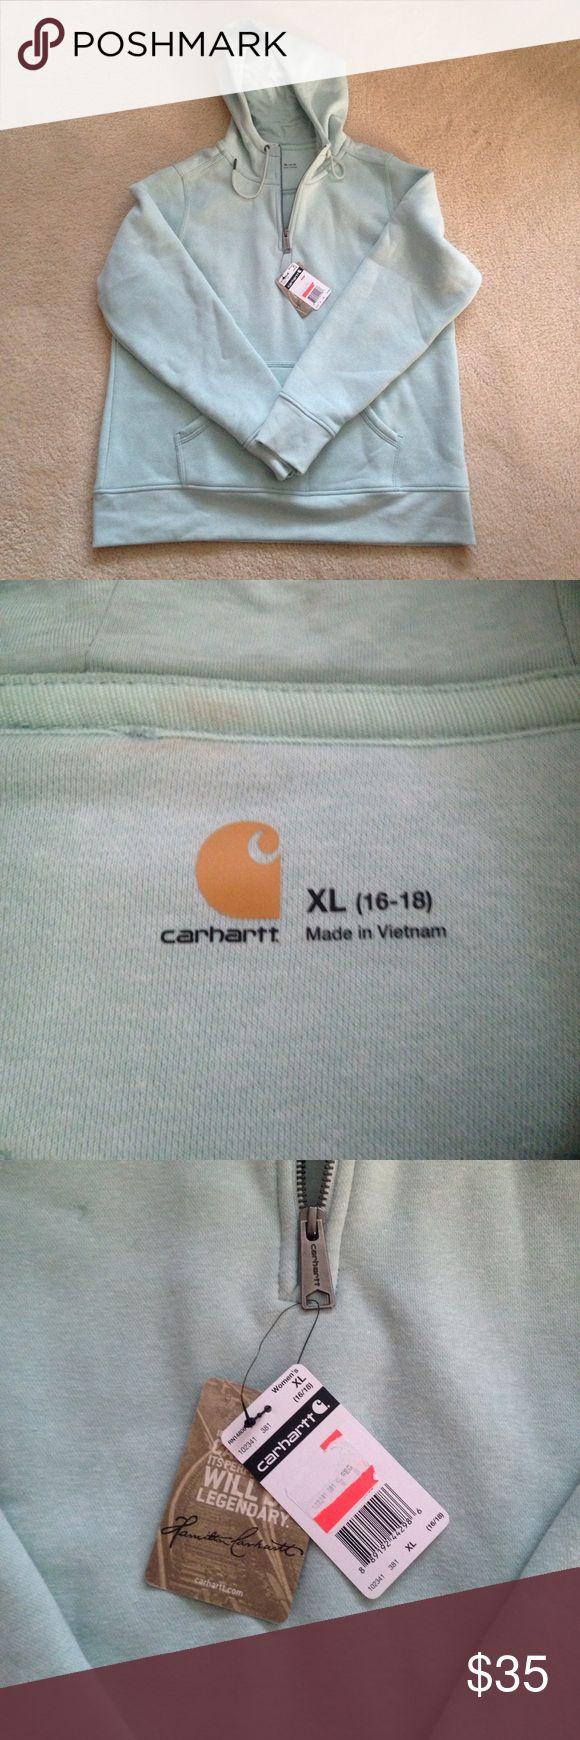 Carhartt 1/4 zip hooded sweatshirt Sea foam green women's Carhartt 1/4 zip hooded pullover sweatshirt. NWT. Perfect condition, never worn. I've lost weight and need a small size. Carhartt Tops Sweatshirts & Hoodies